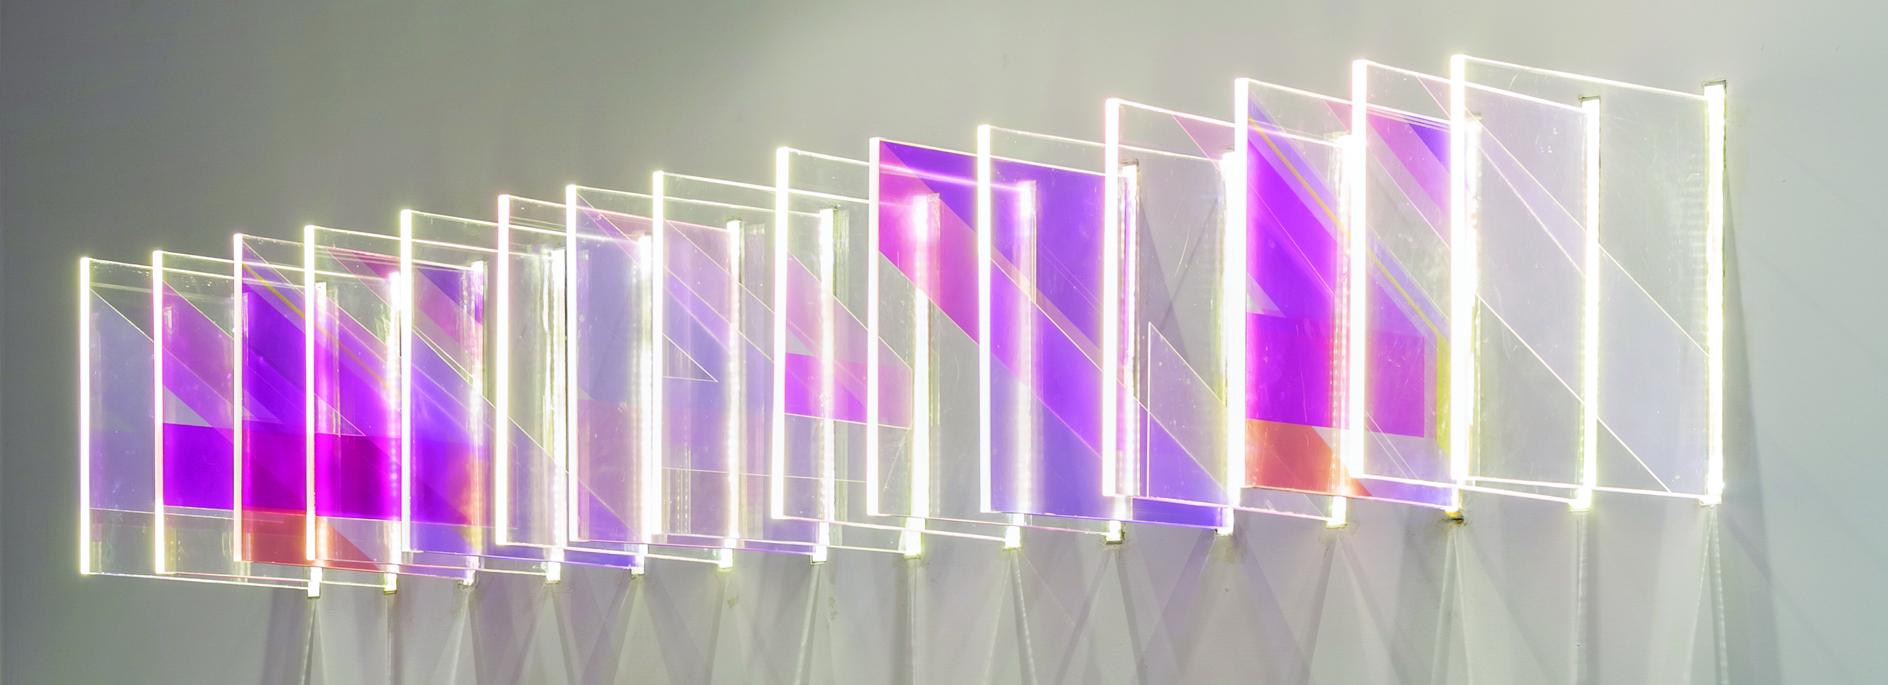 Blog Main Page Lumus Light Fixture Installation 3